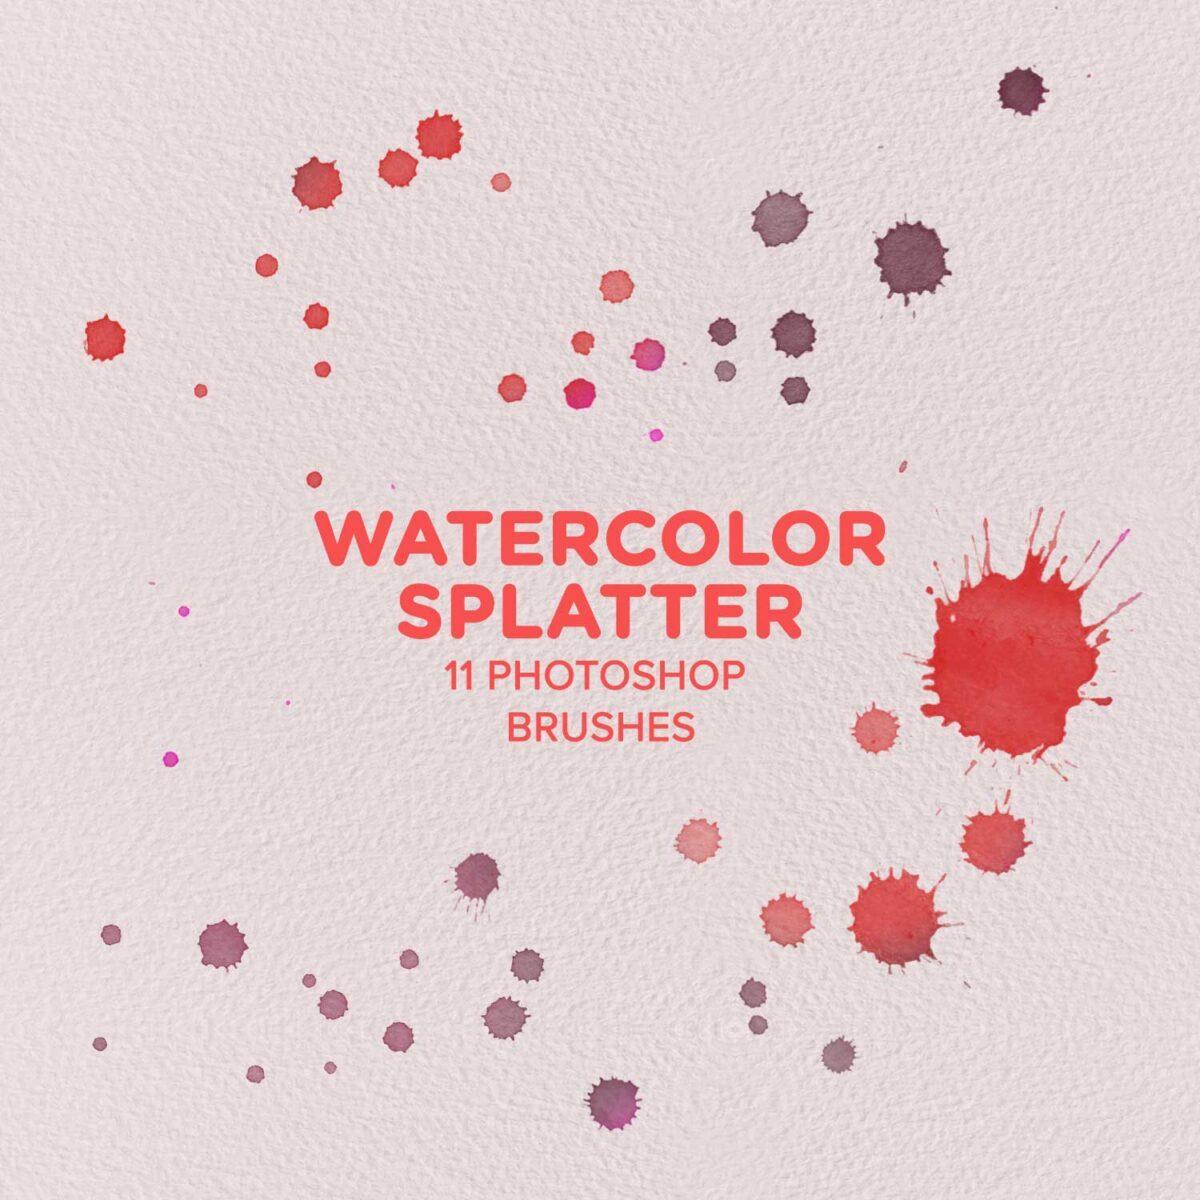 Free Watercolor Splatter Brushes